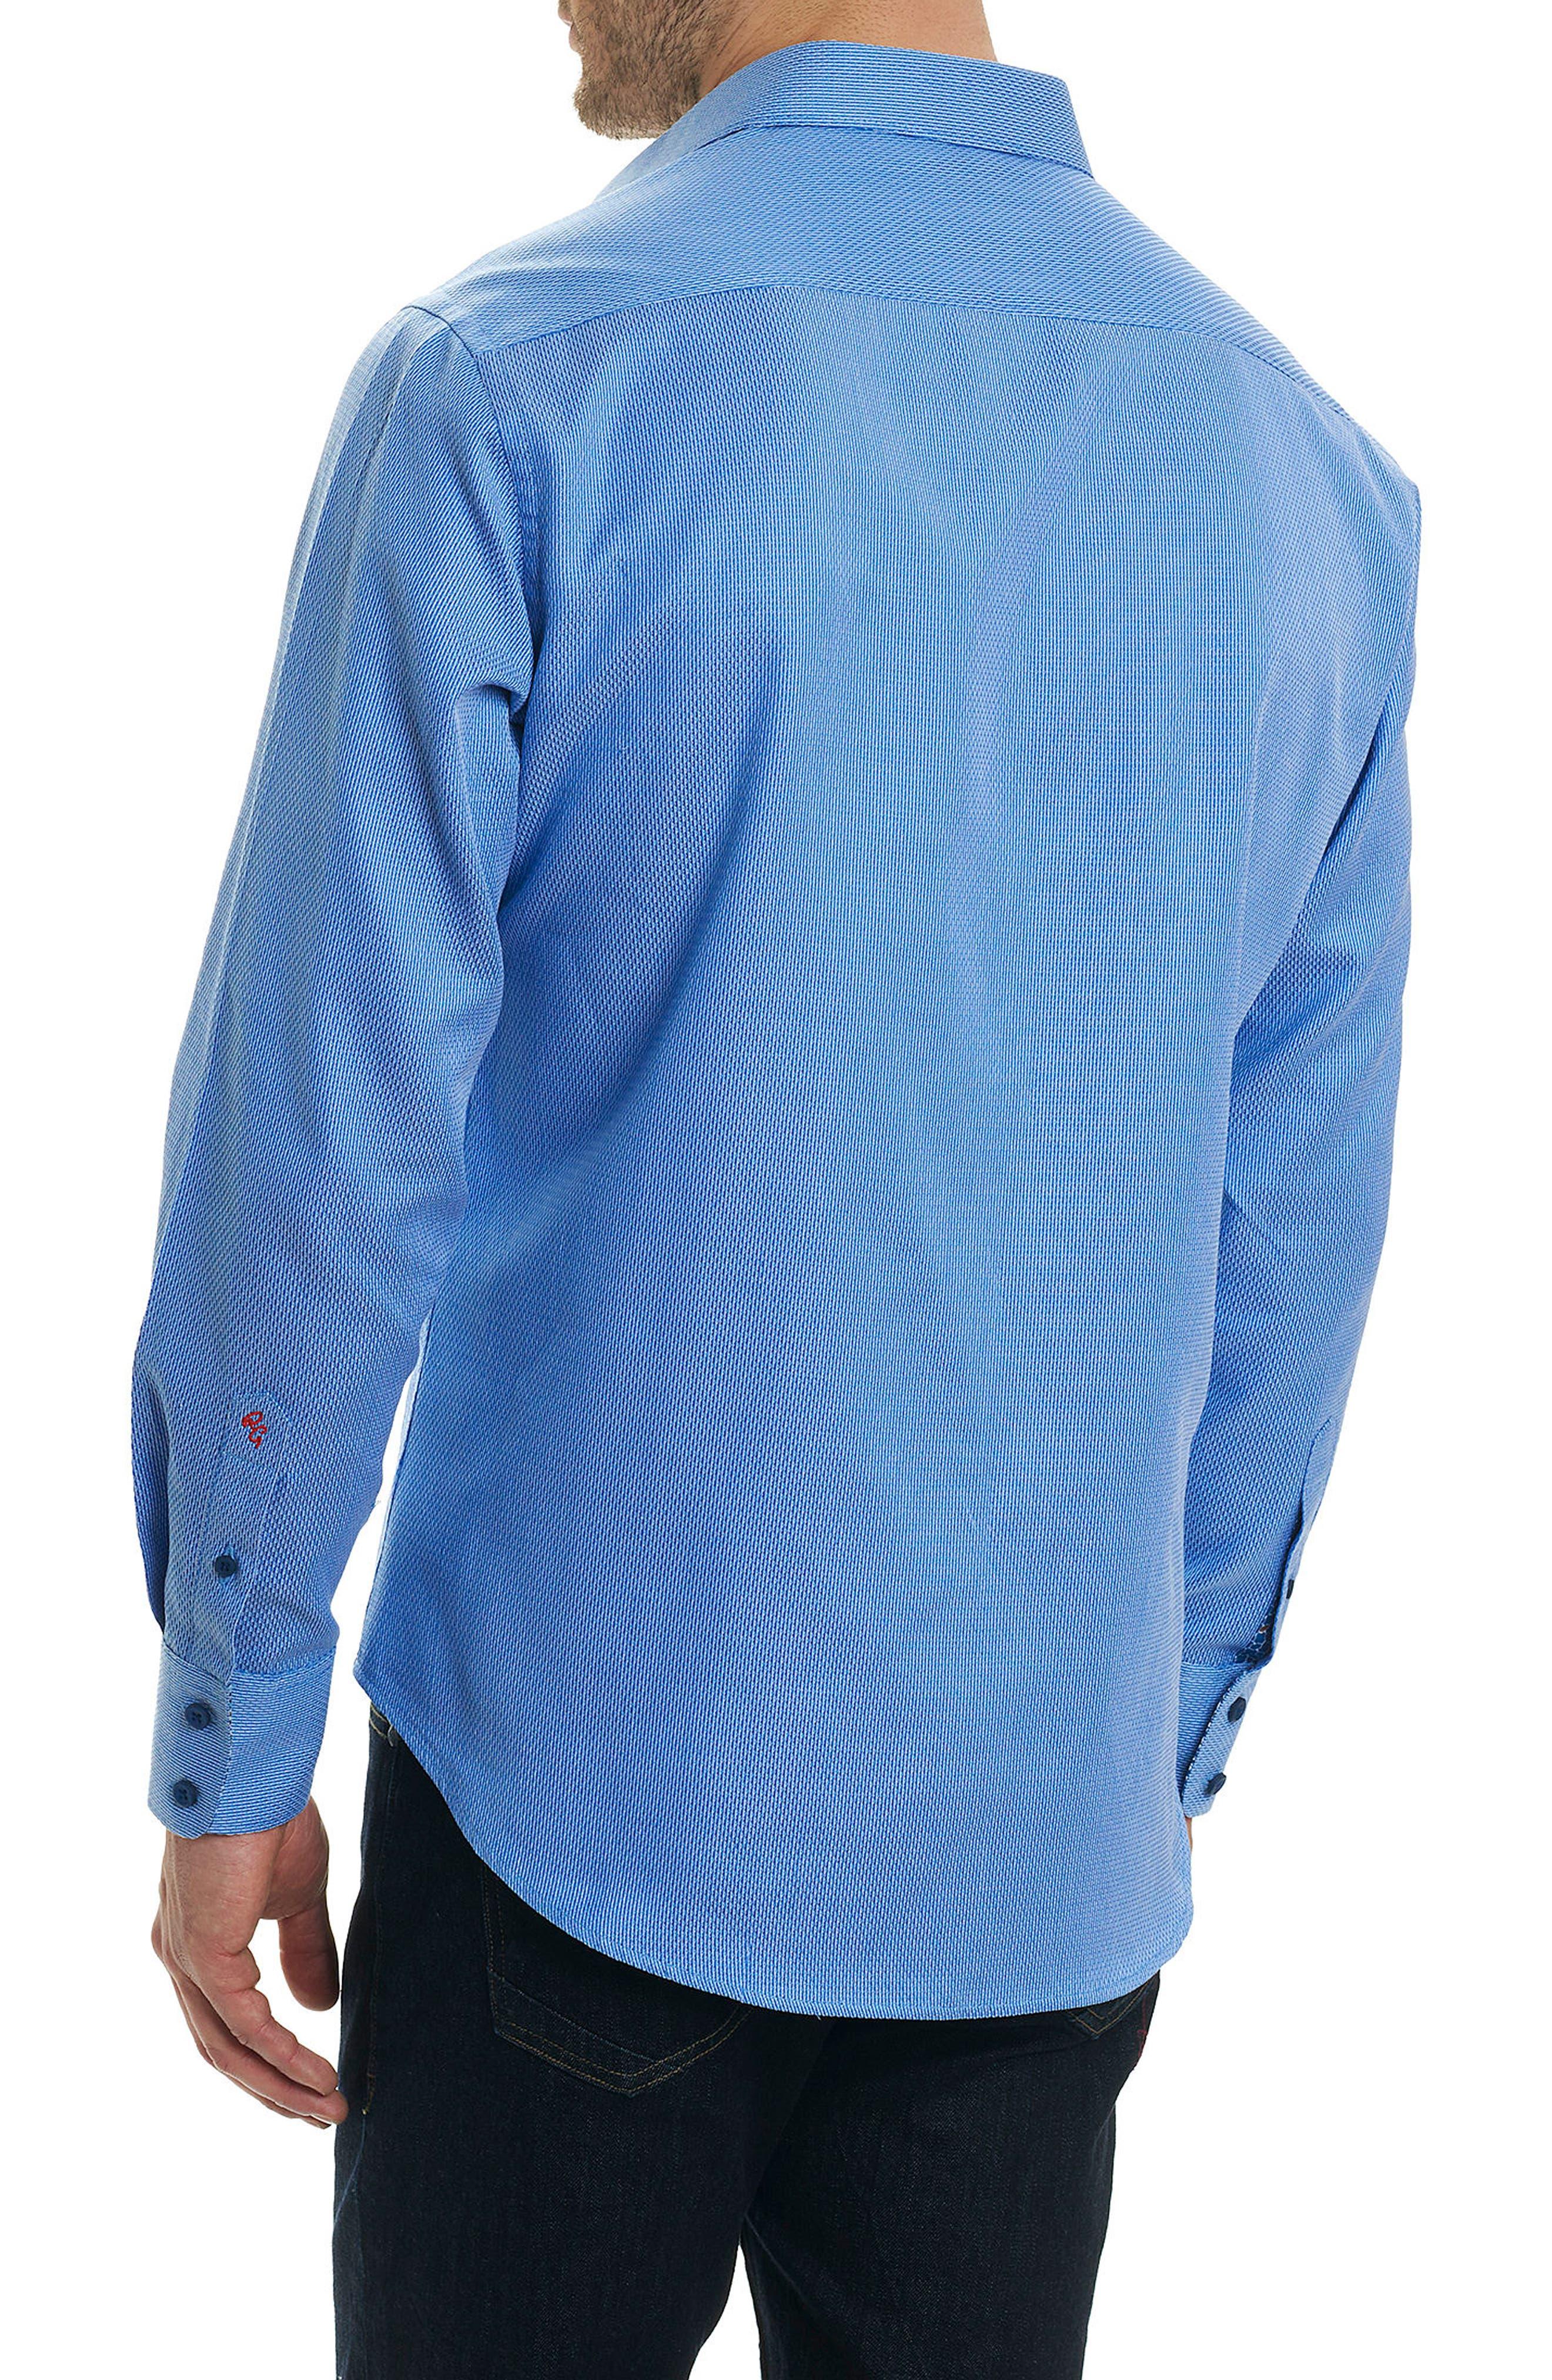 Jobson Classic Fit Sport Shirt,                             Alternate thumbnail 2, color,                             400